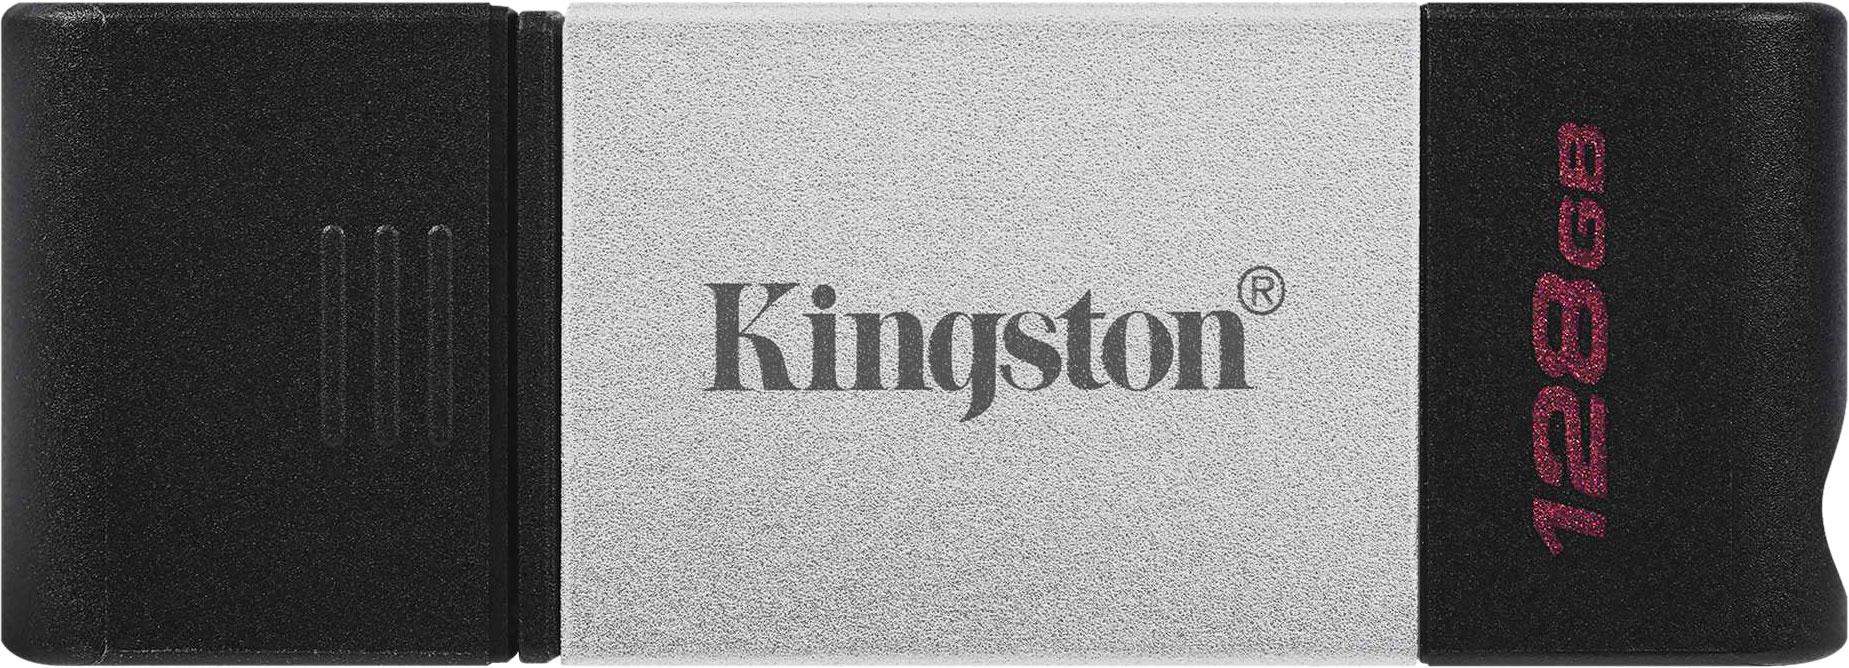 Флеш-накопитель Kingston DataTraveler 80 OTG USB Type-C, 128 ГБ